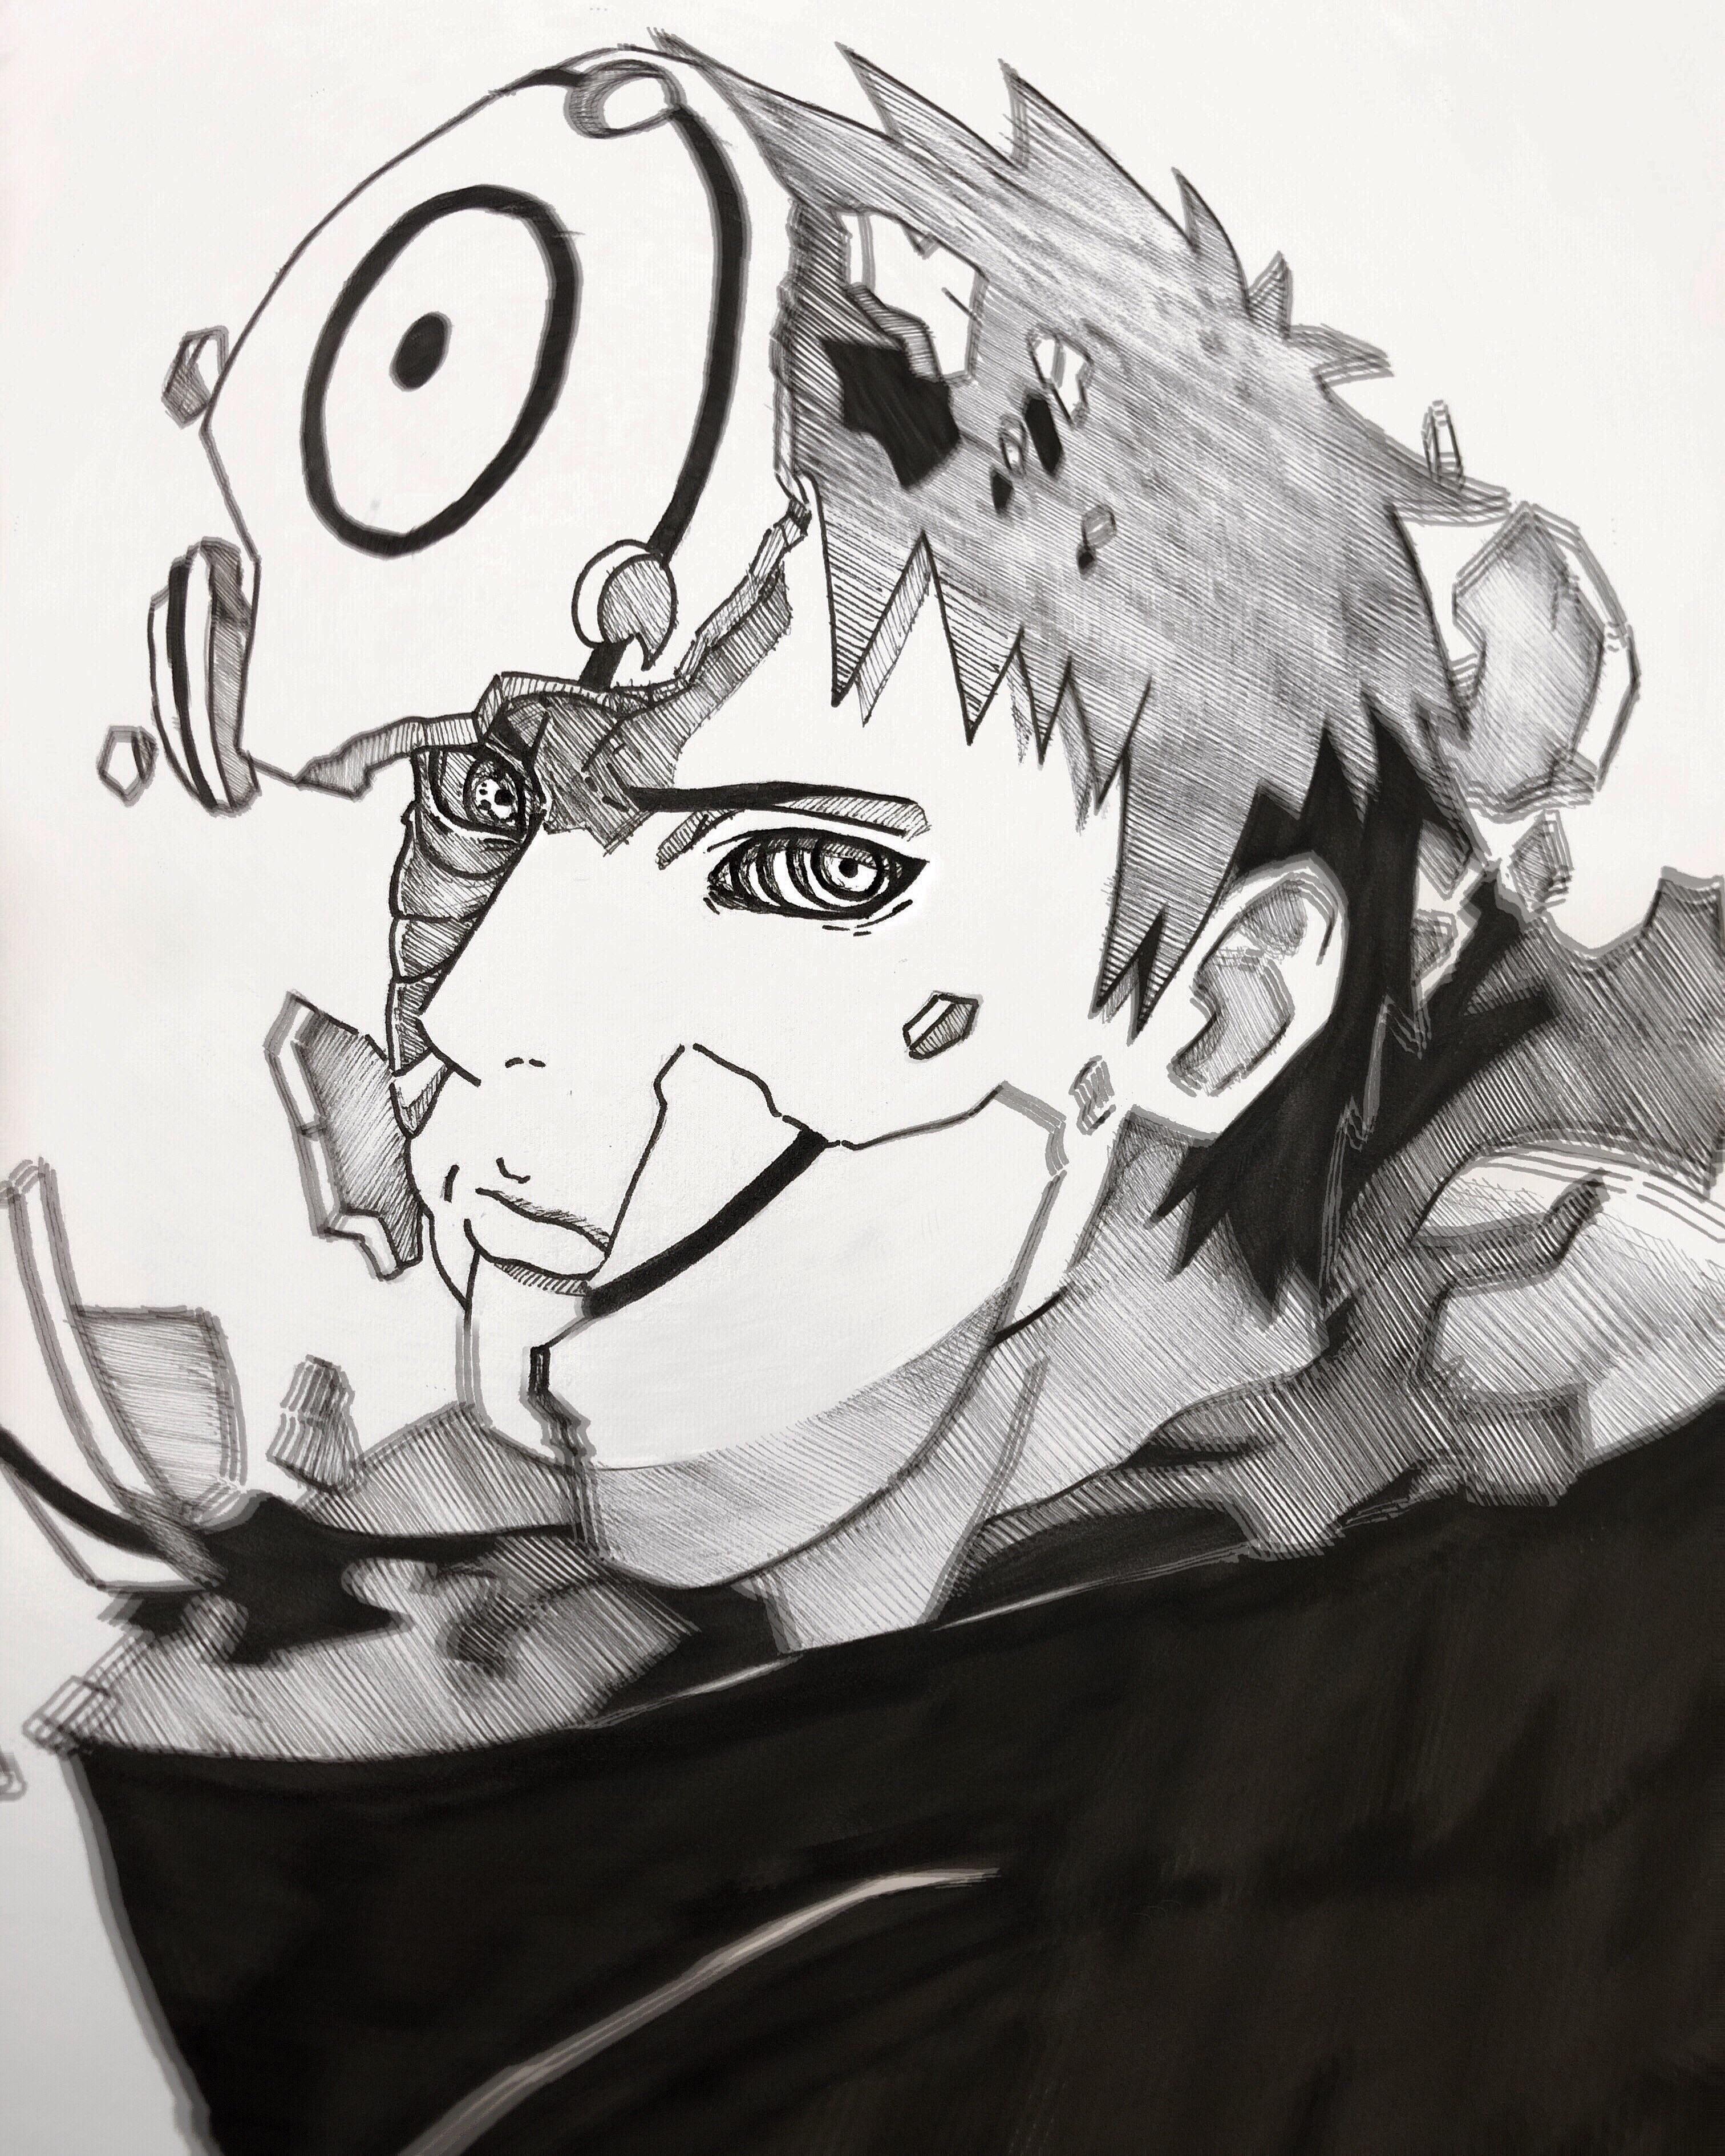 Back With Another One Drew Obito Uchiha Naruto Naruto Sketch Naruto Tattoo Naruto Drawings